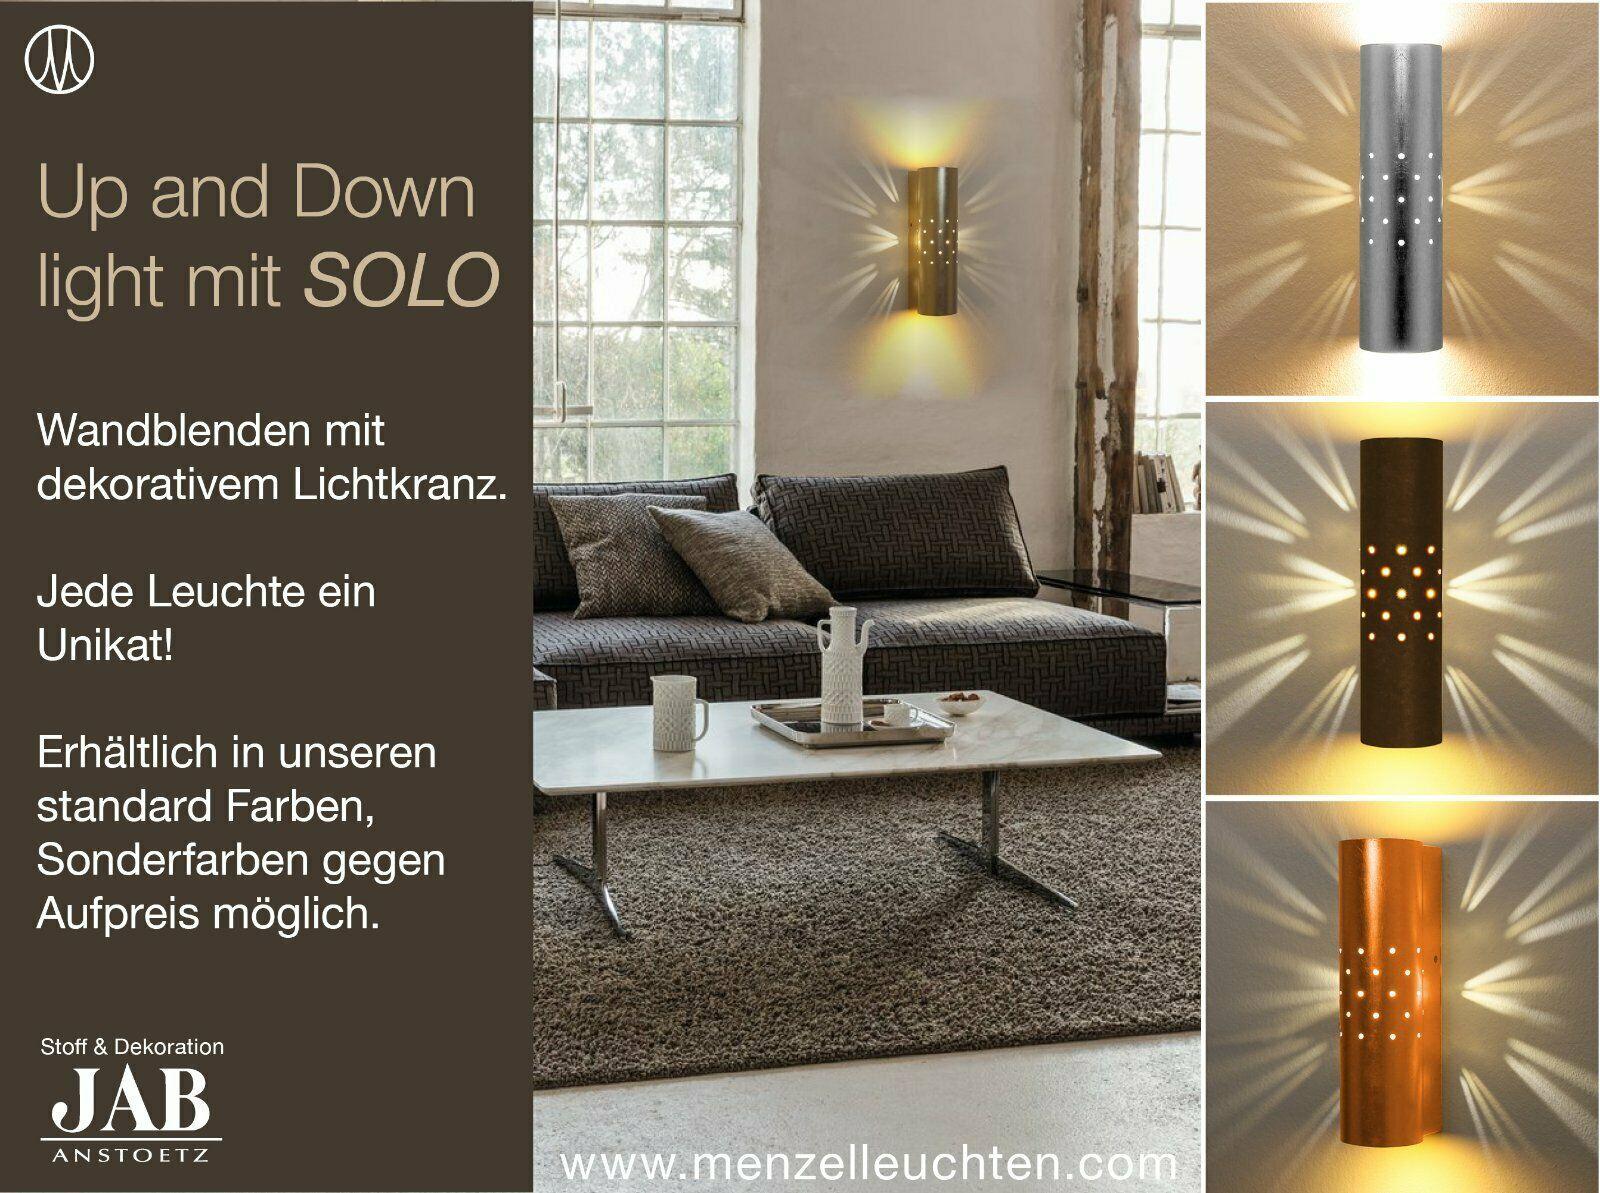 Wandlampe Mit Strahlenkranz In Bayern Ruhpolding Ebay Kleinanzeigen Wandlampe Wandbeleuchtung Wand